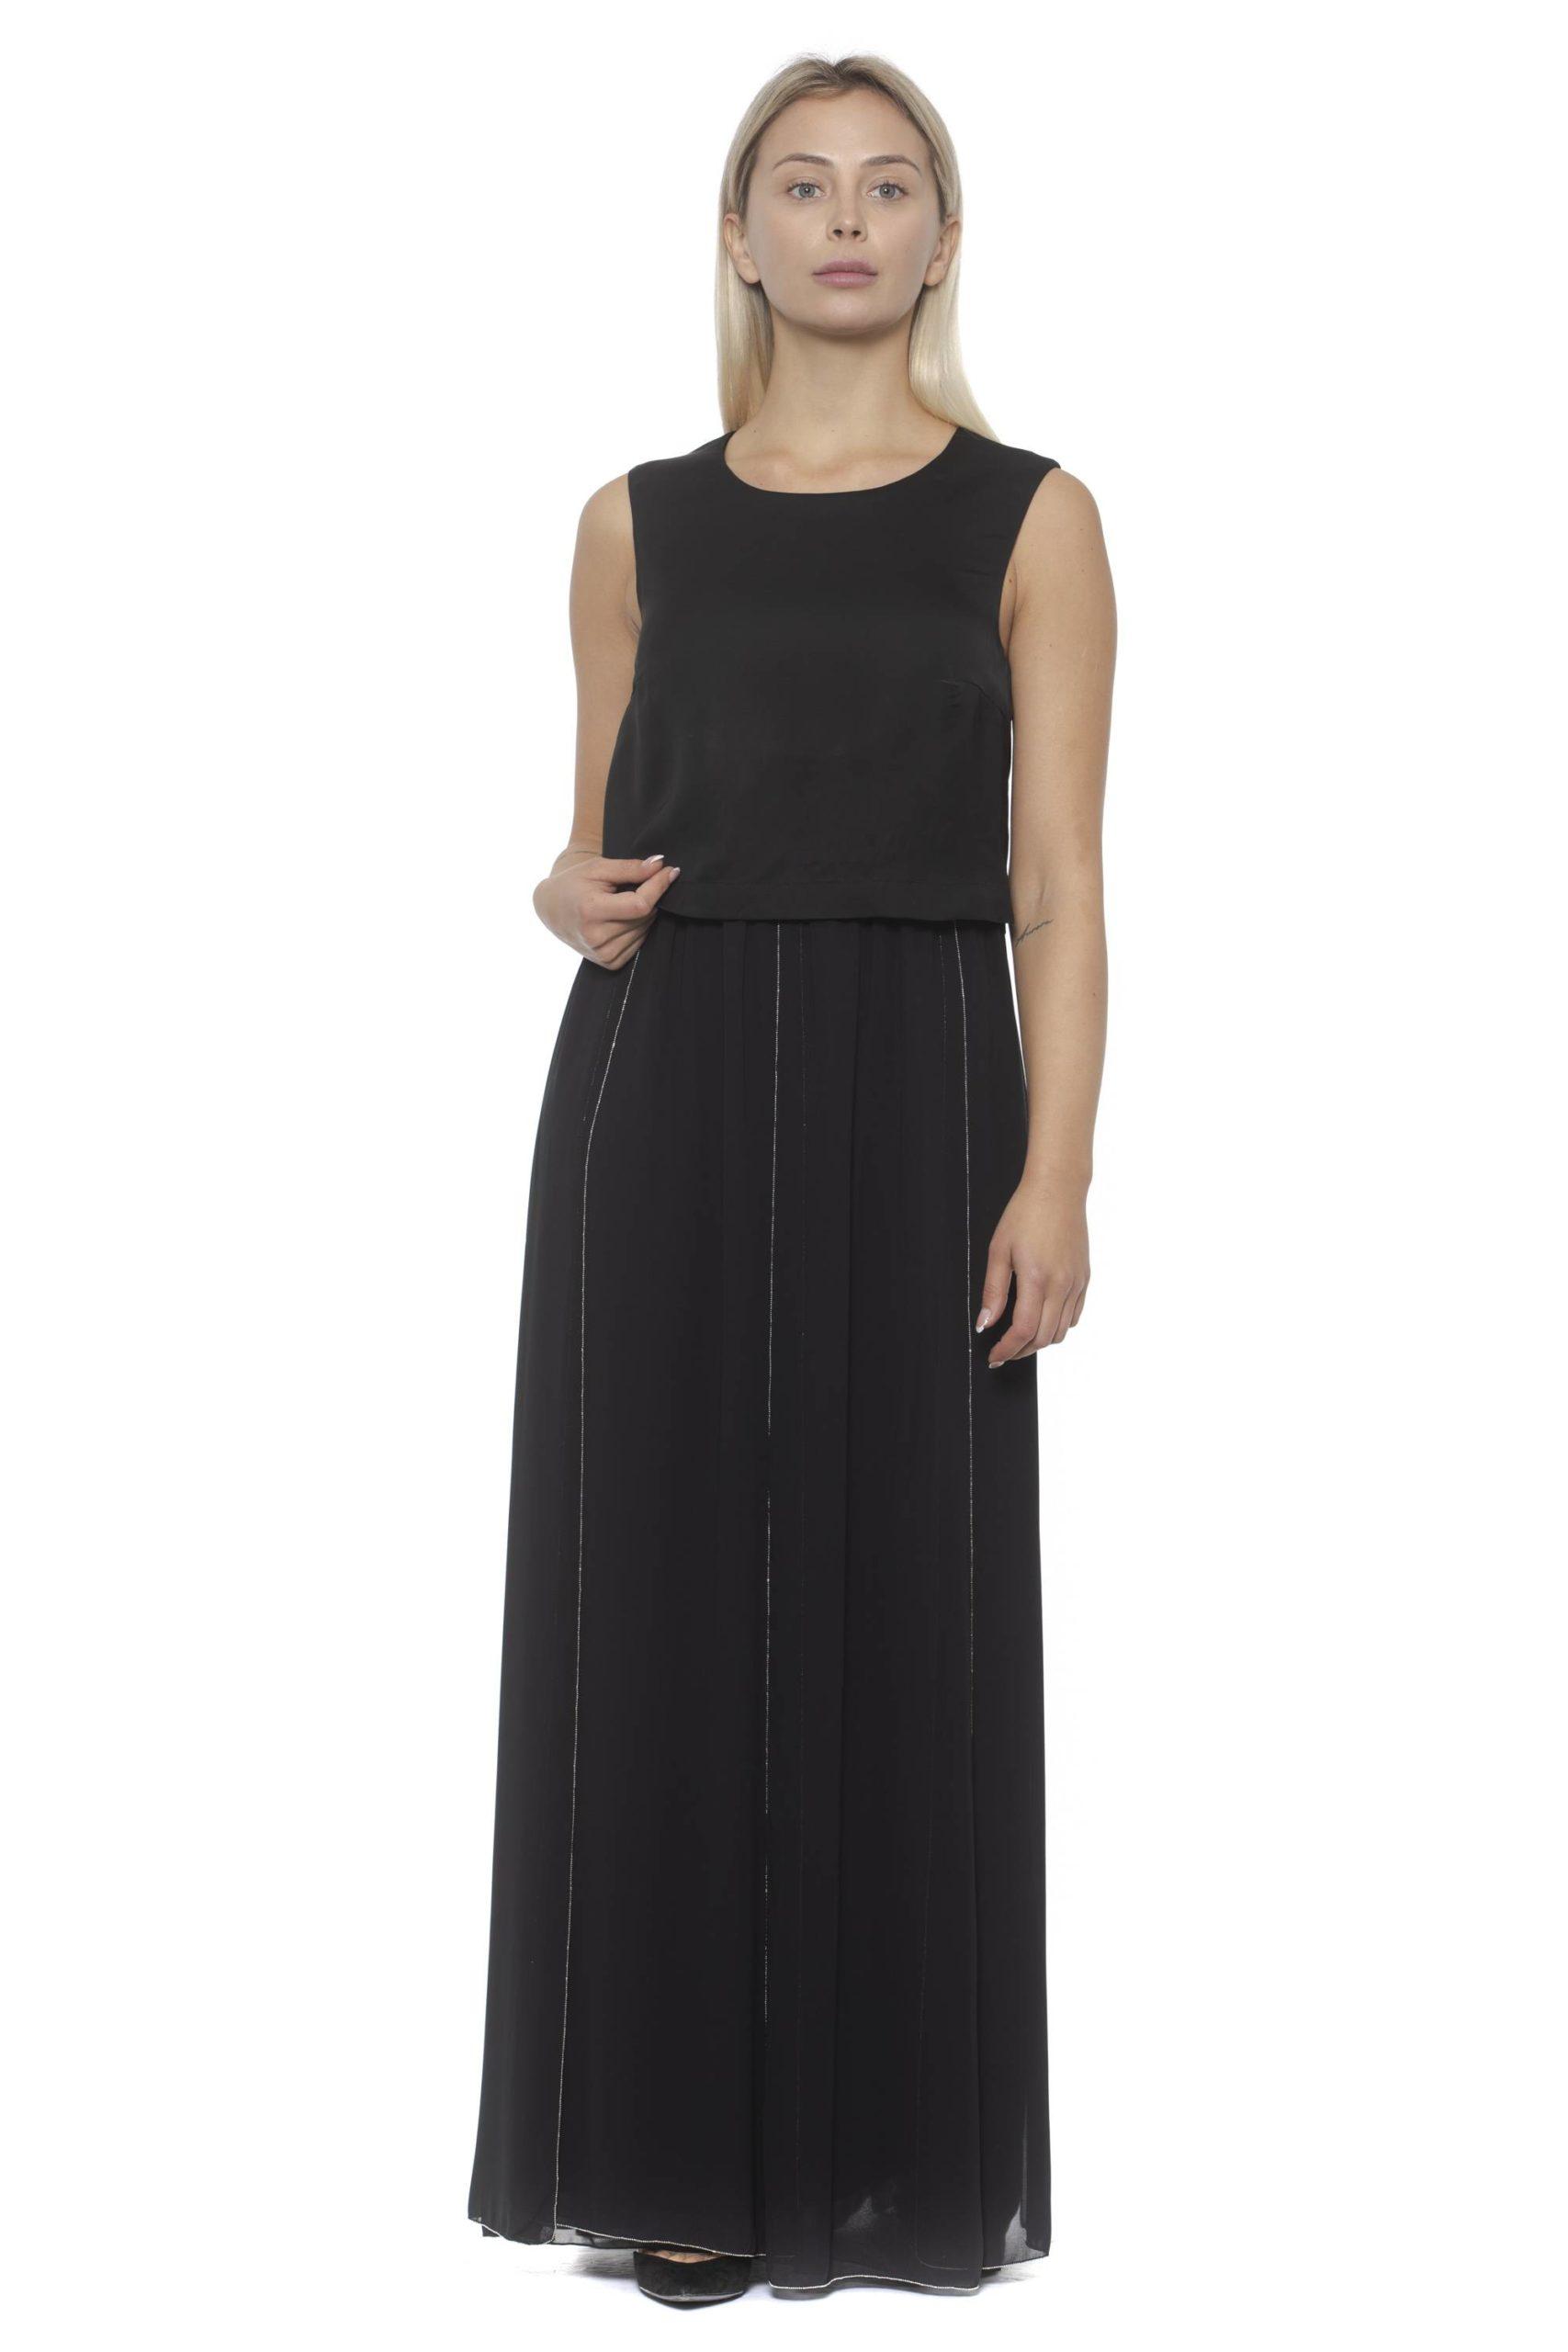 Peserico Women's Anero Dress Black PE1381857 - IT42 | S